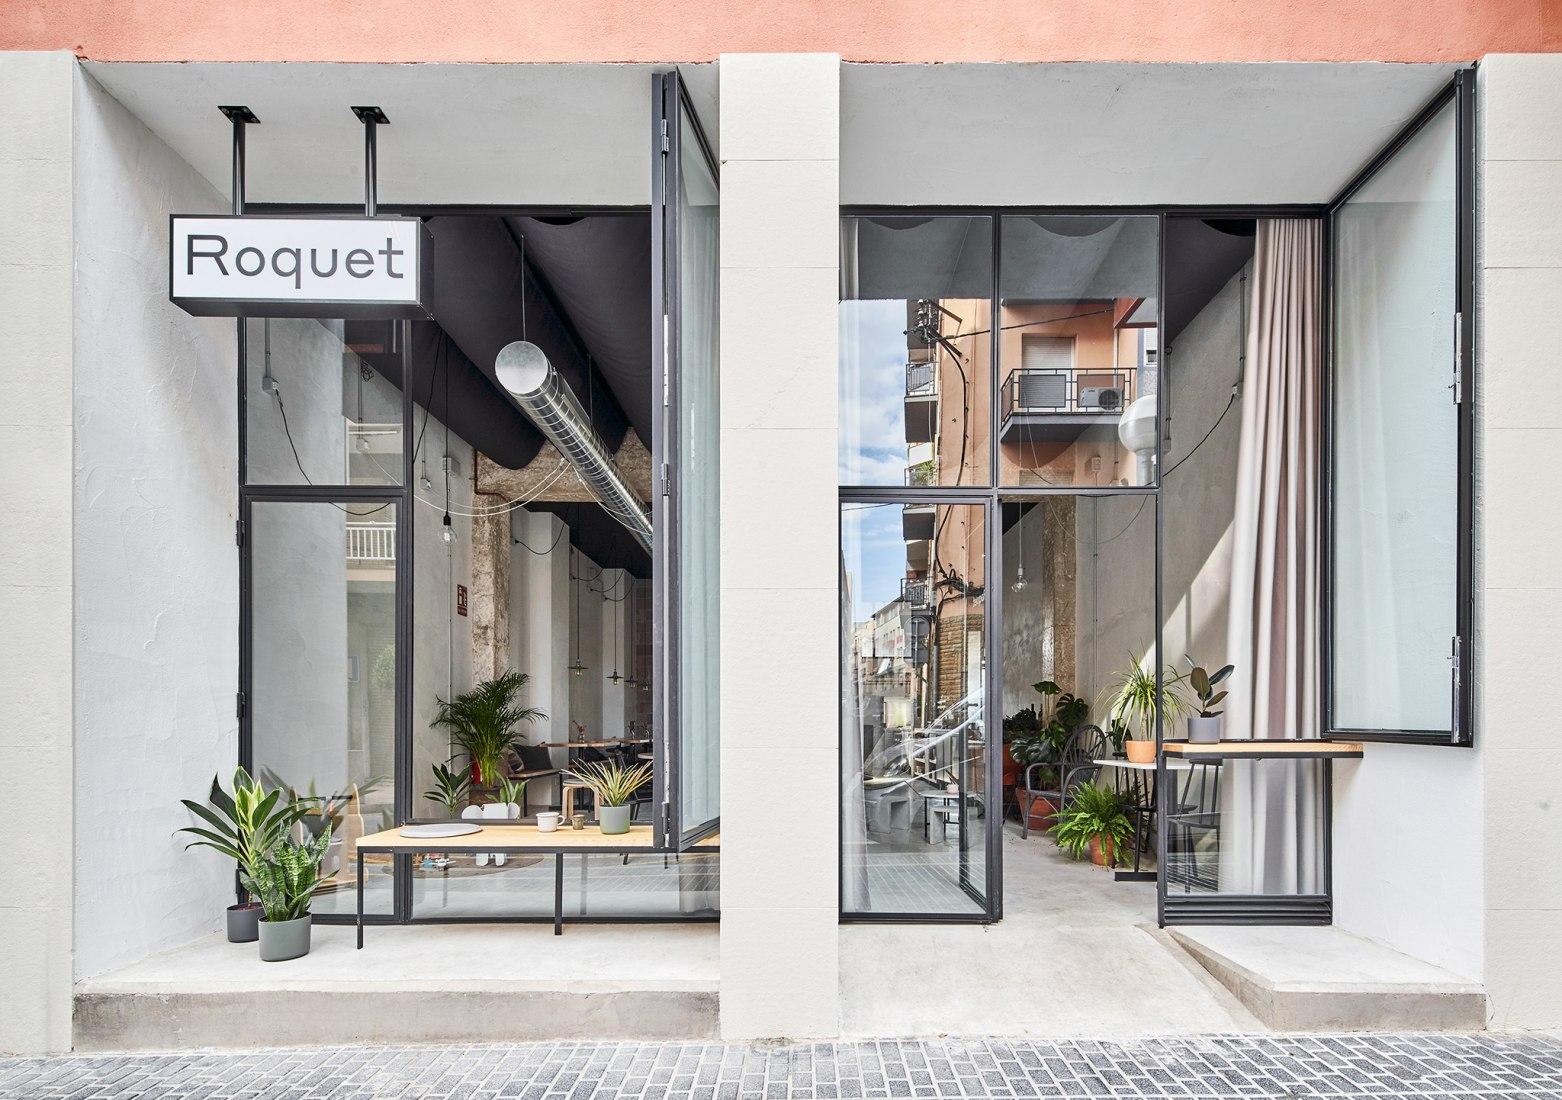 Café Roquet por NUA arquitectures. Fotografía por José Hevia